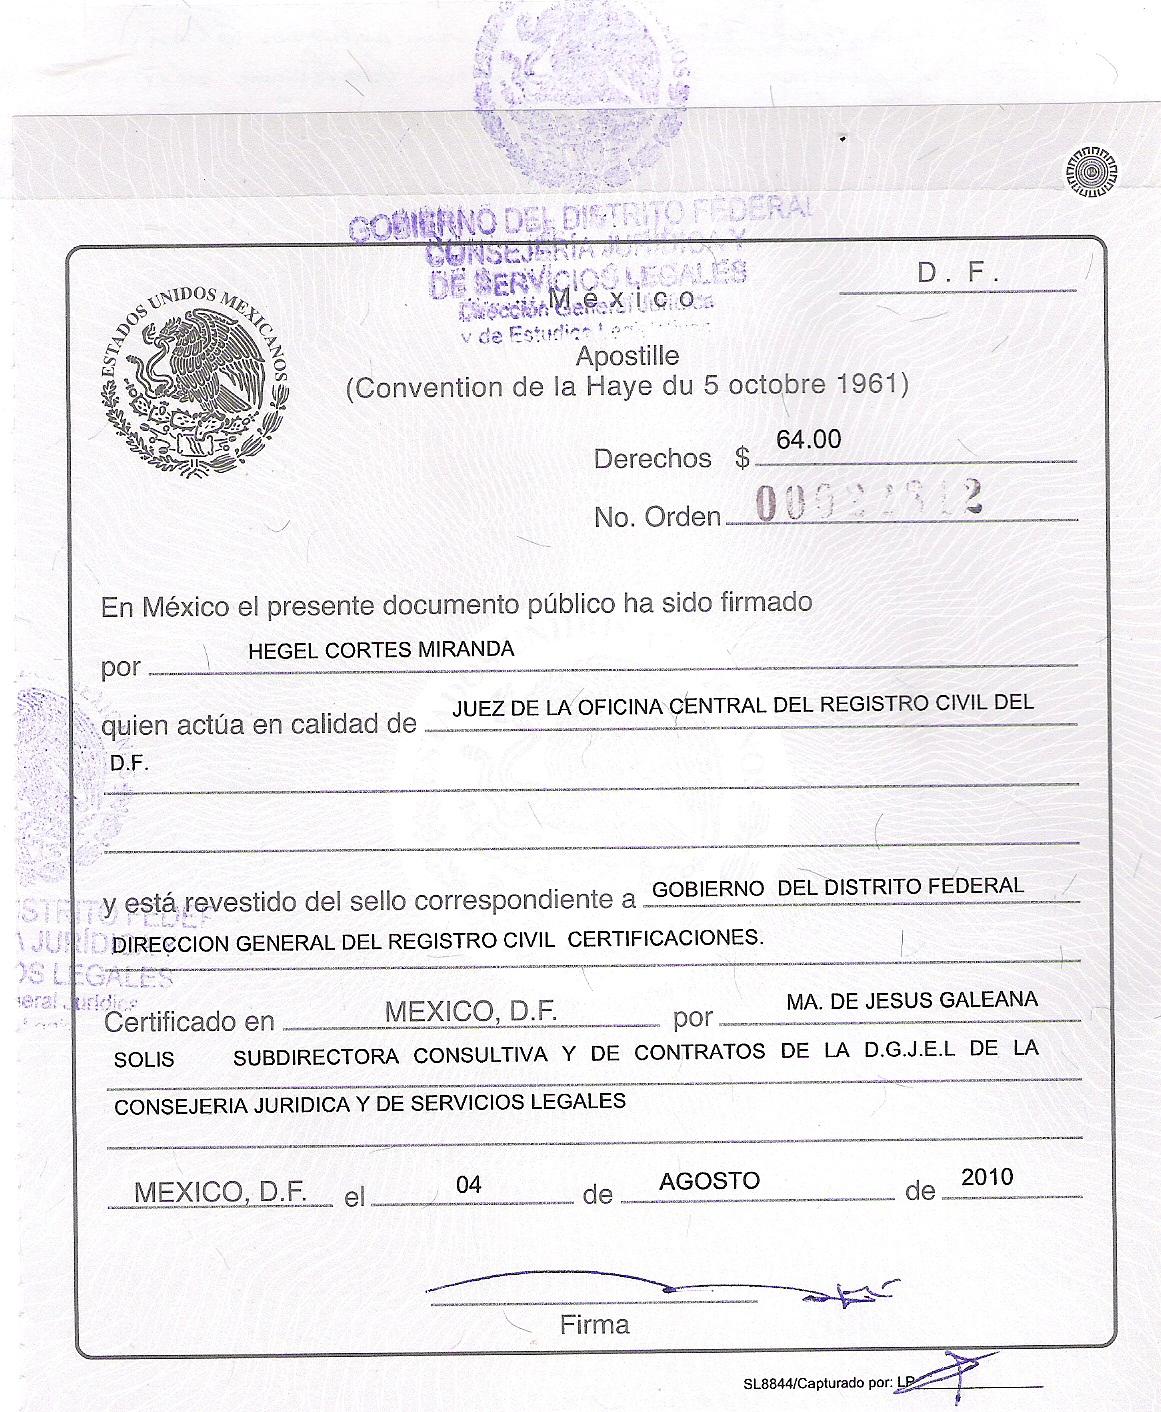 licenciatura requisitos: